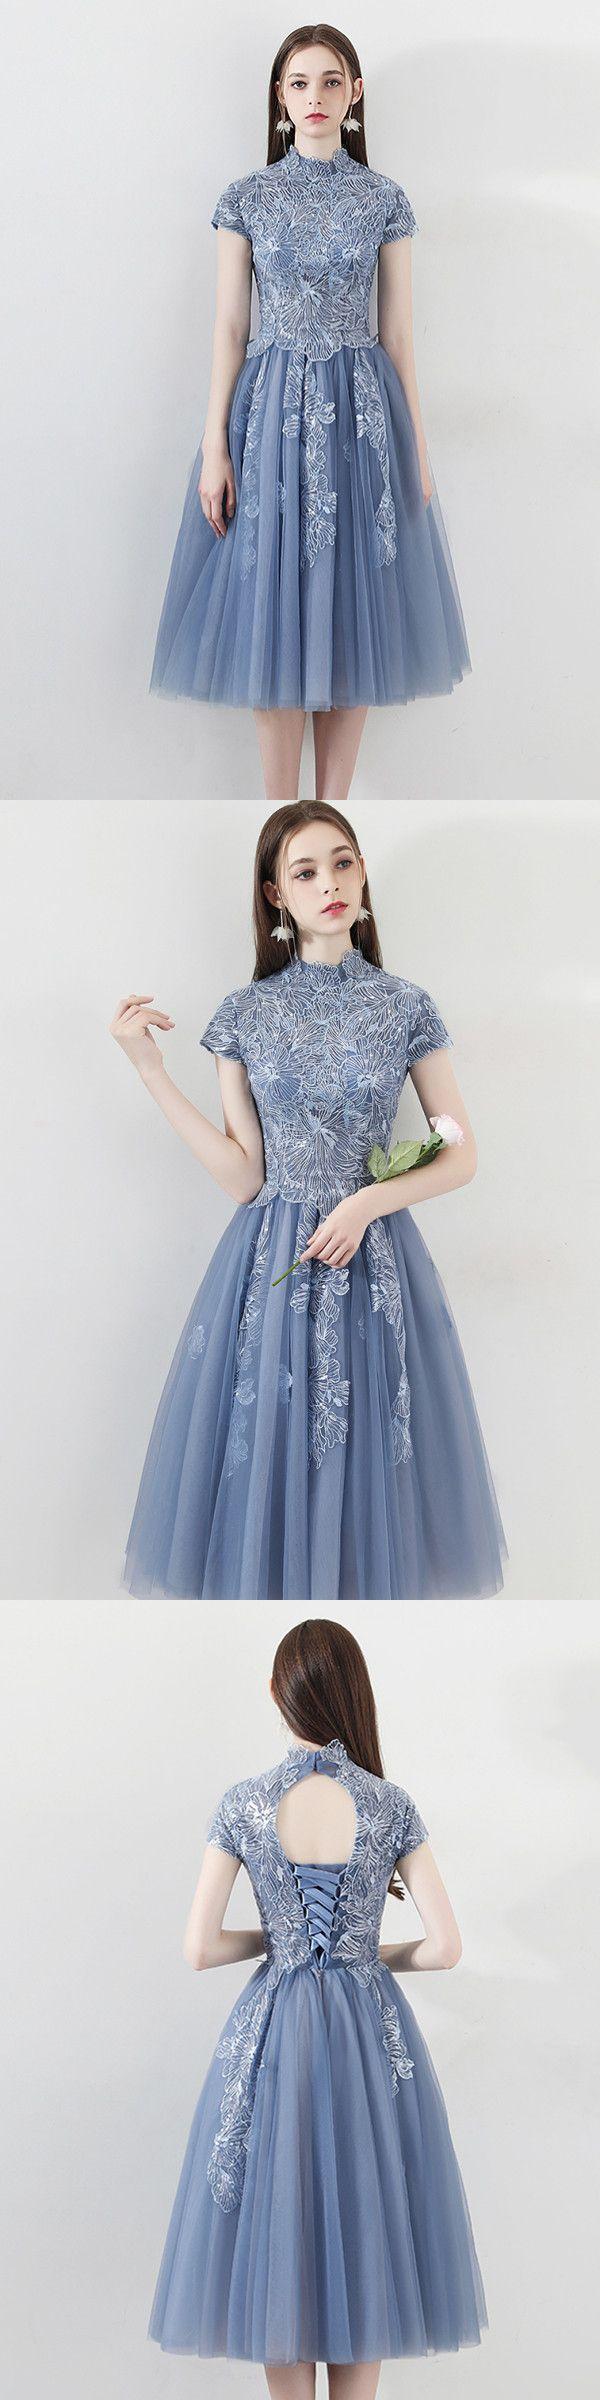 25c3917baa30 Homecoming Dresses Cheap Modest | Huston Fislar Photography